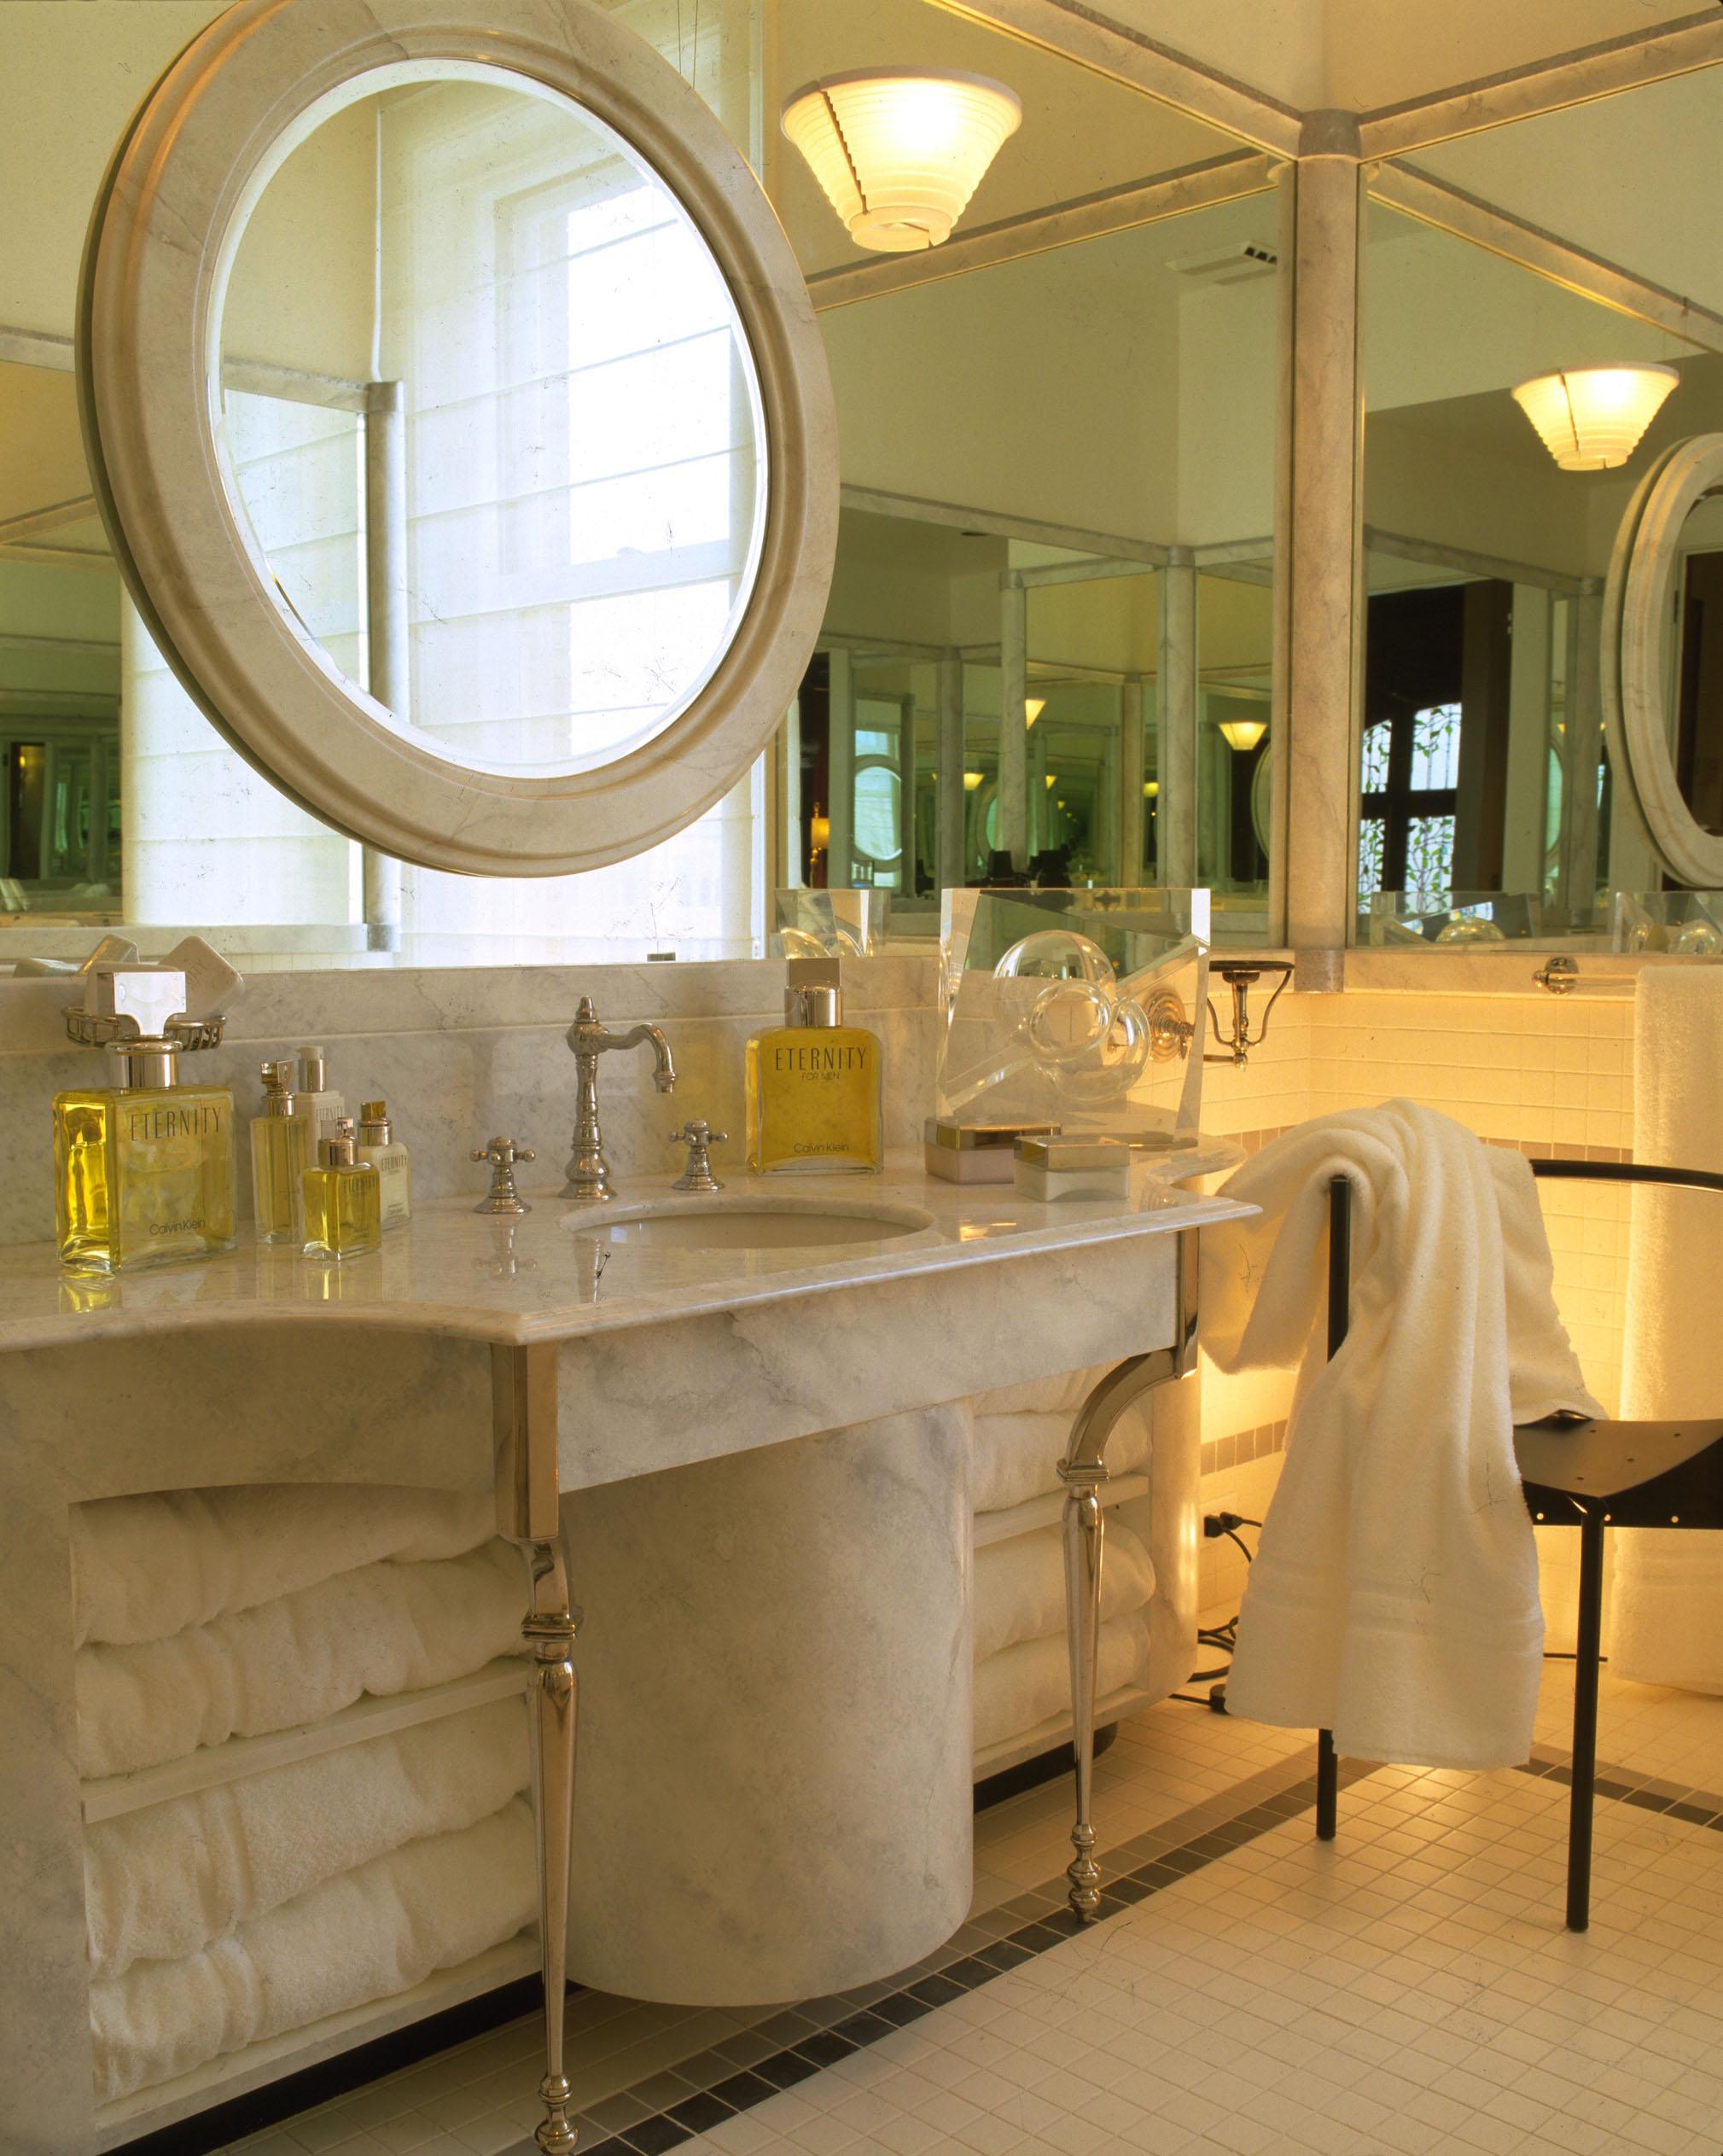 Luxury Bathroom Designs 2019 - Home Sweet Home   Modern ...